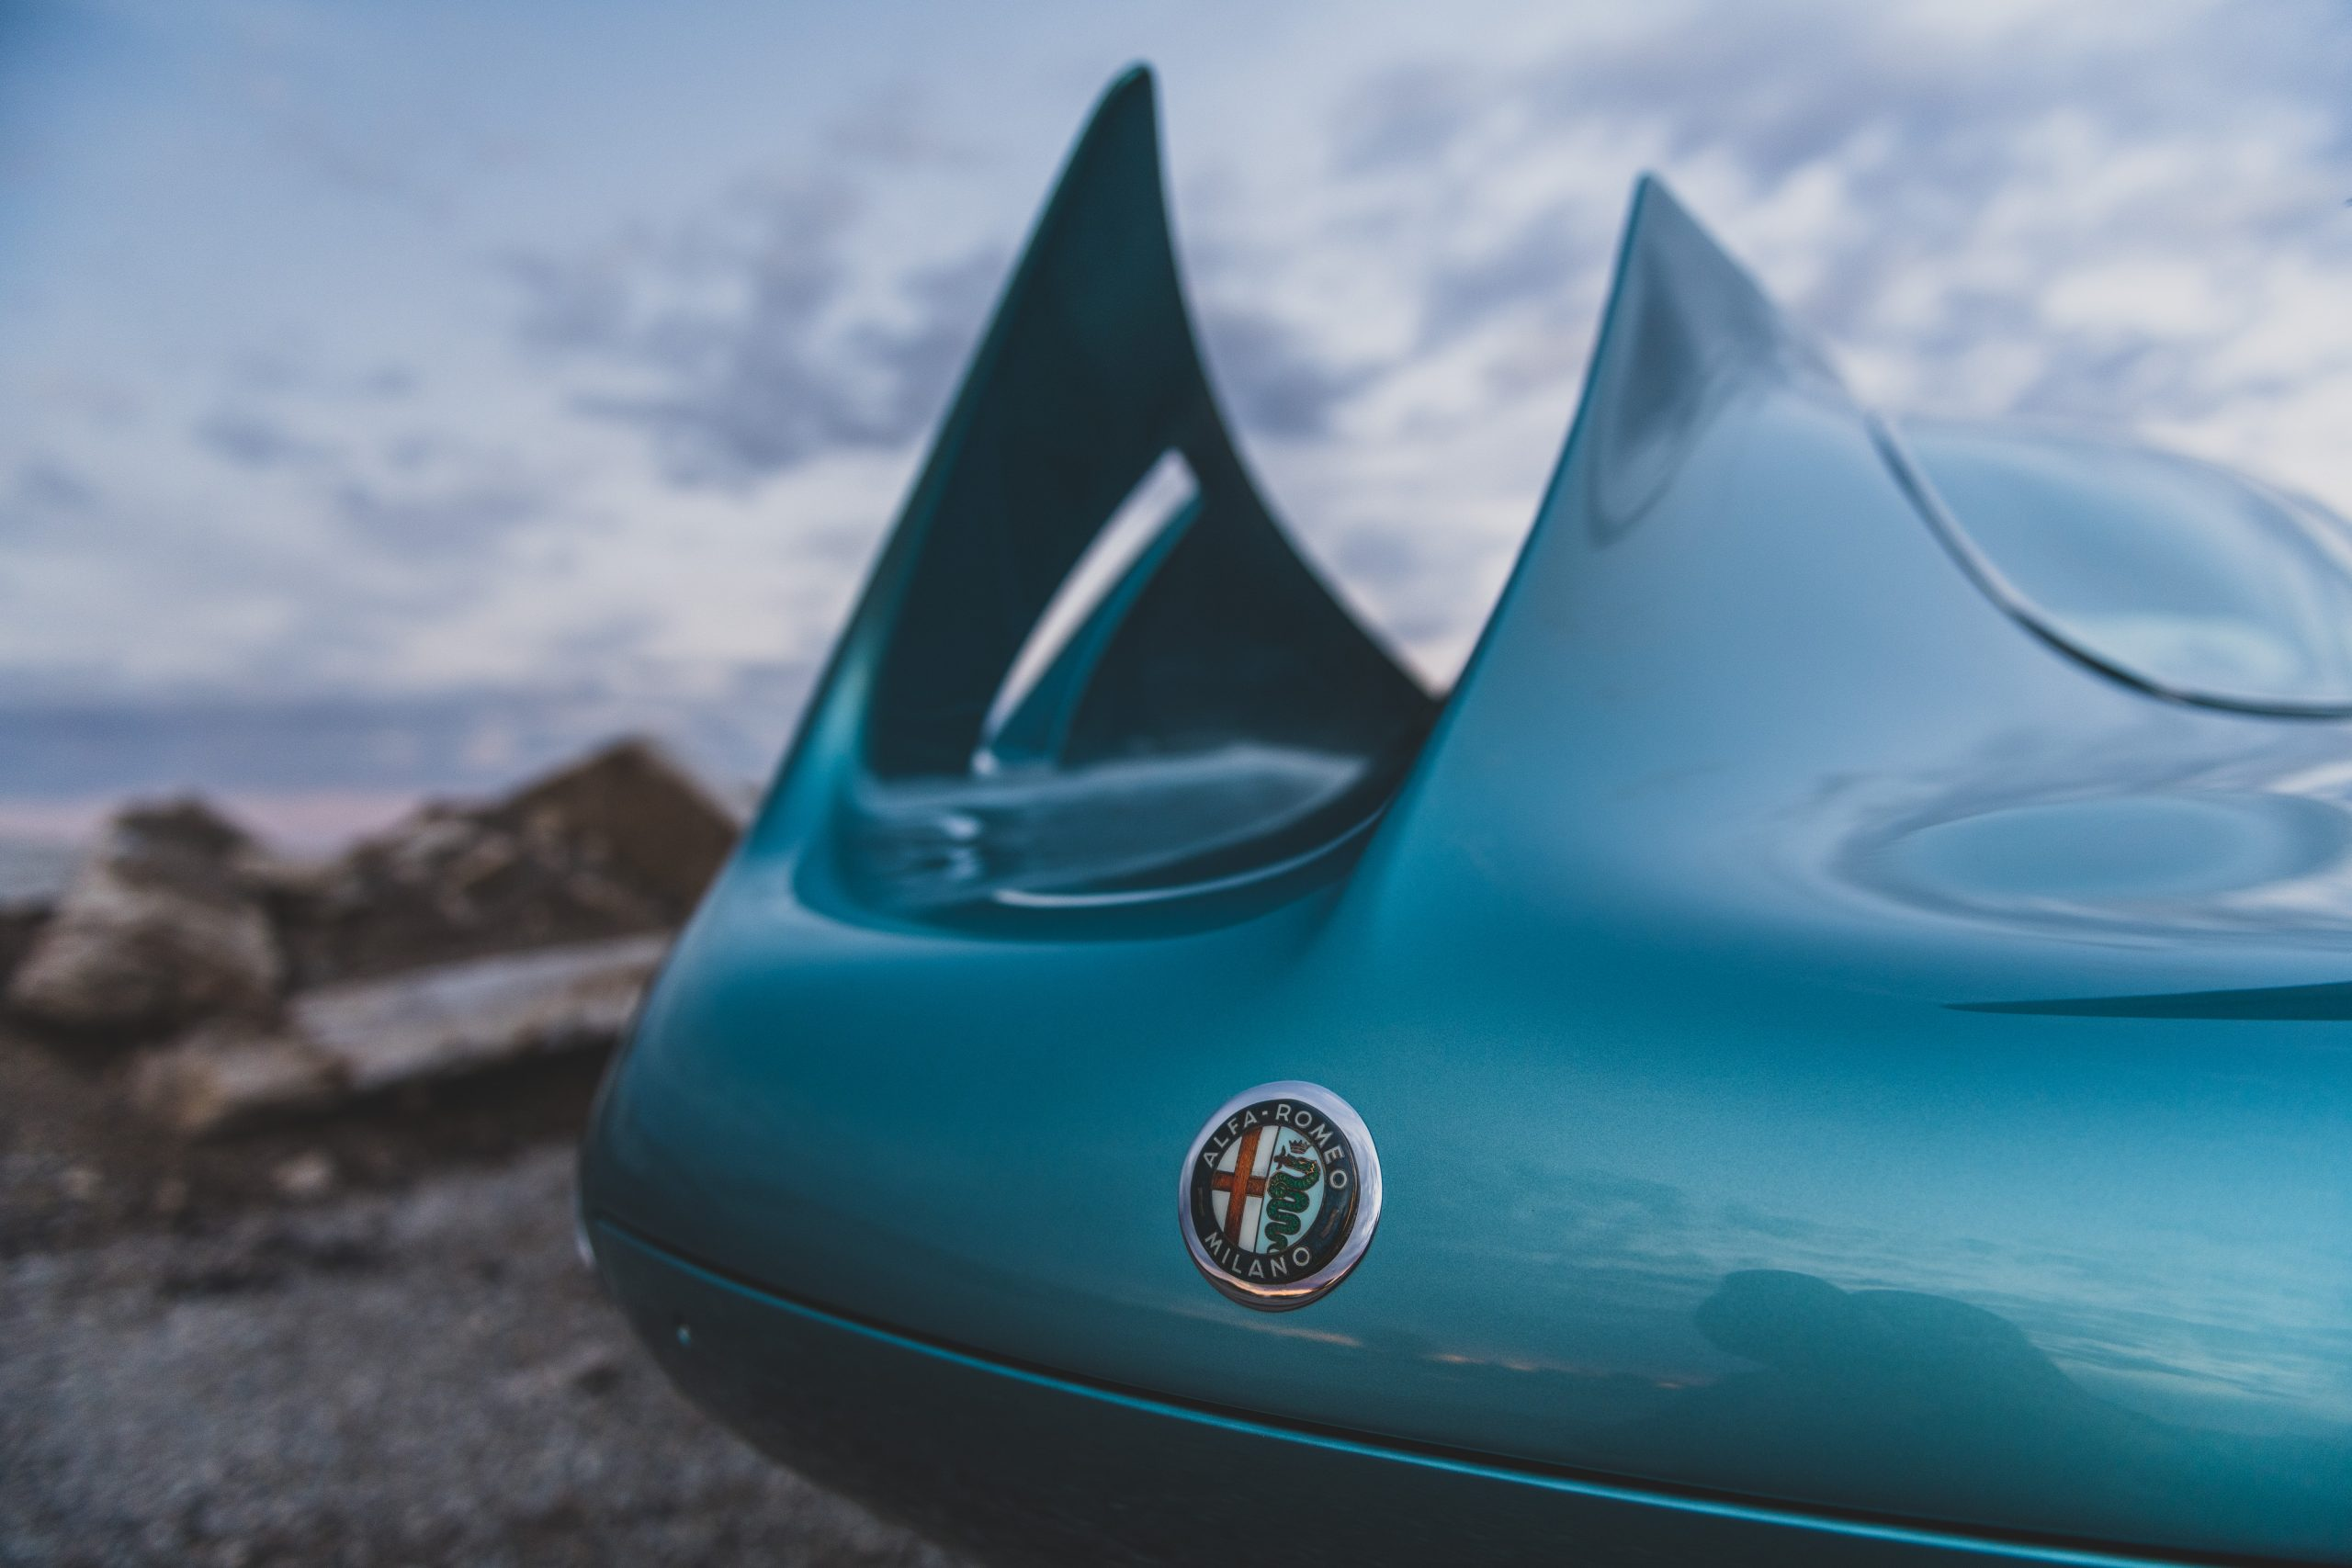 Alfa Romeo Berlina Aerodinamica Tecnica fins